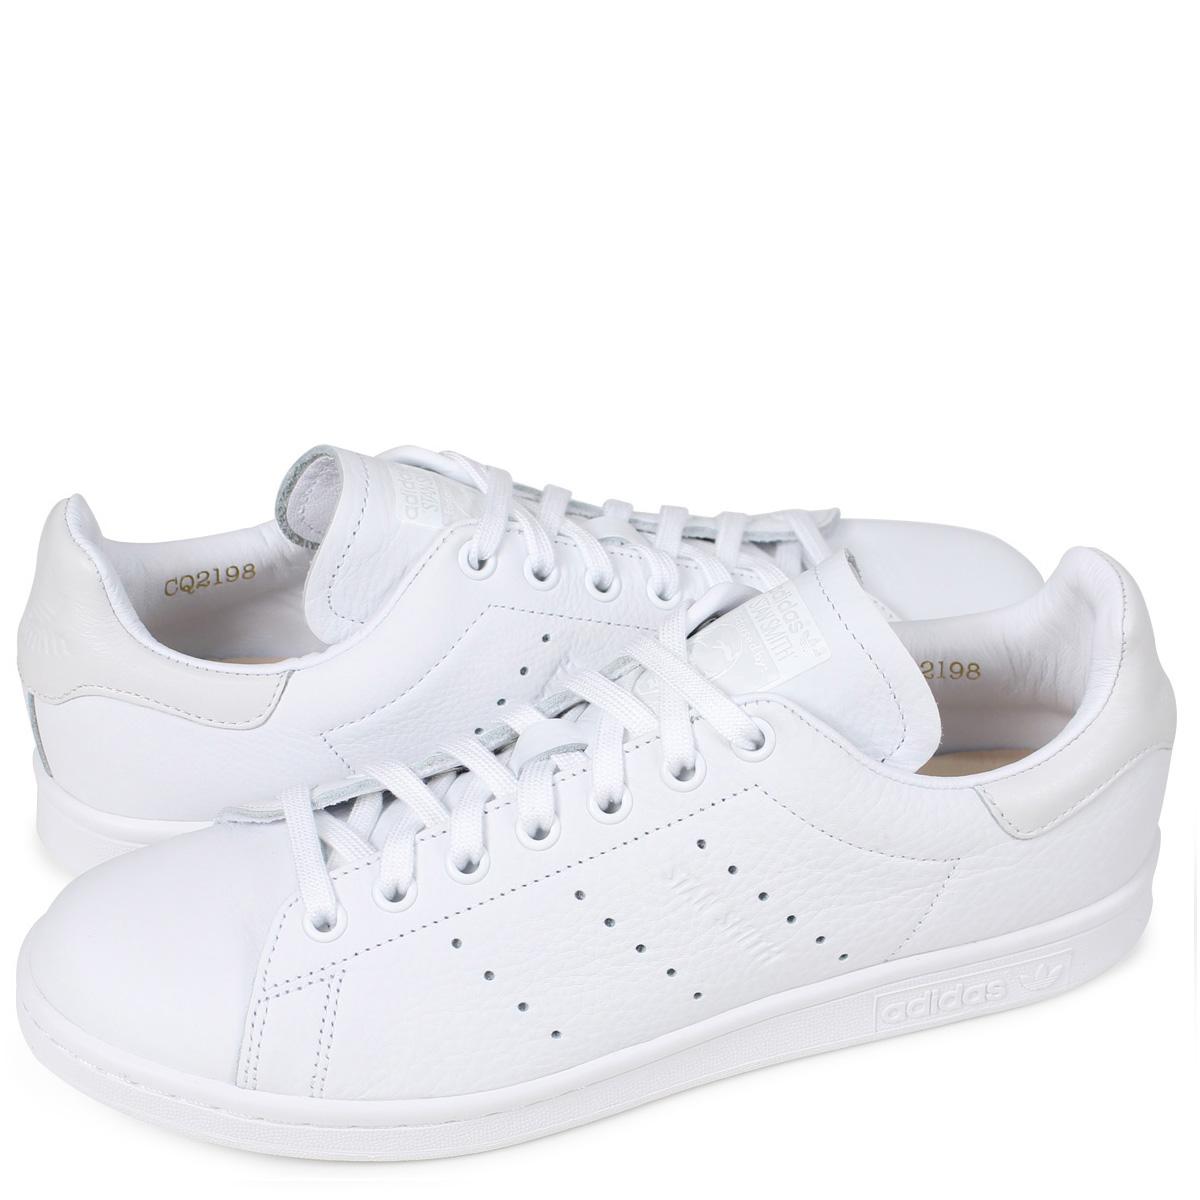 e4788c6a7072 ALLSPORTS  adidas Originals STAN SMITH Adidas Stan Smith sneakers ...